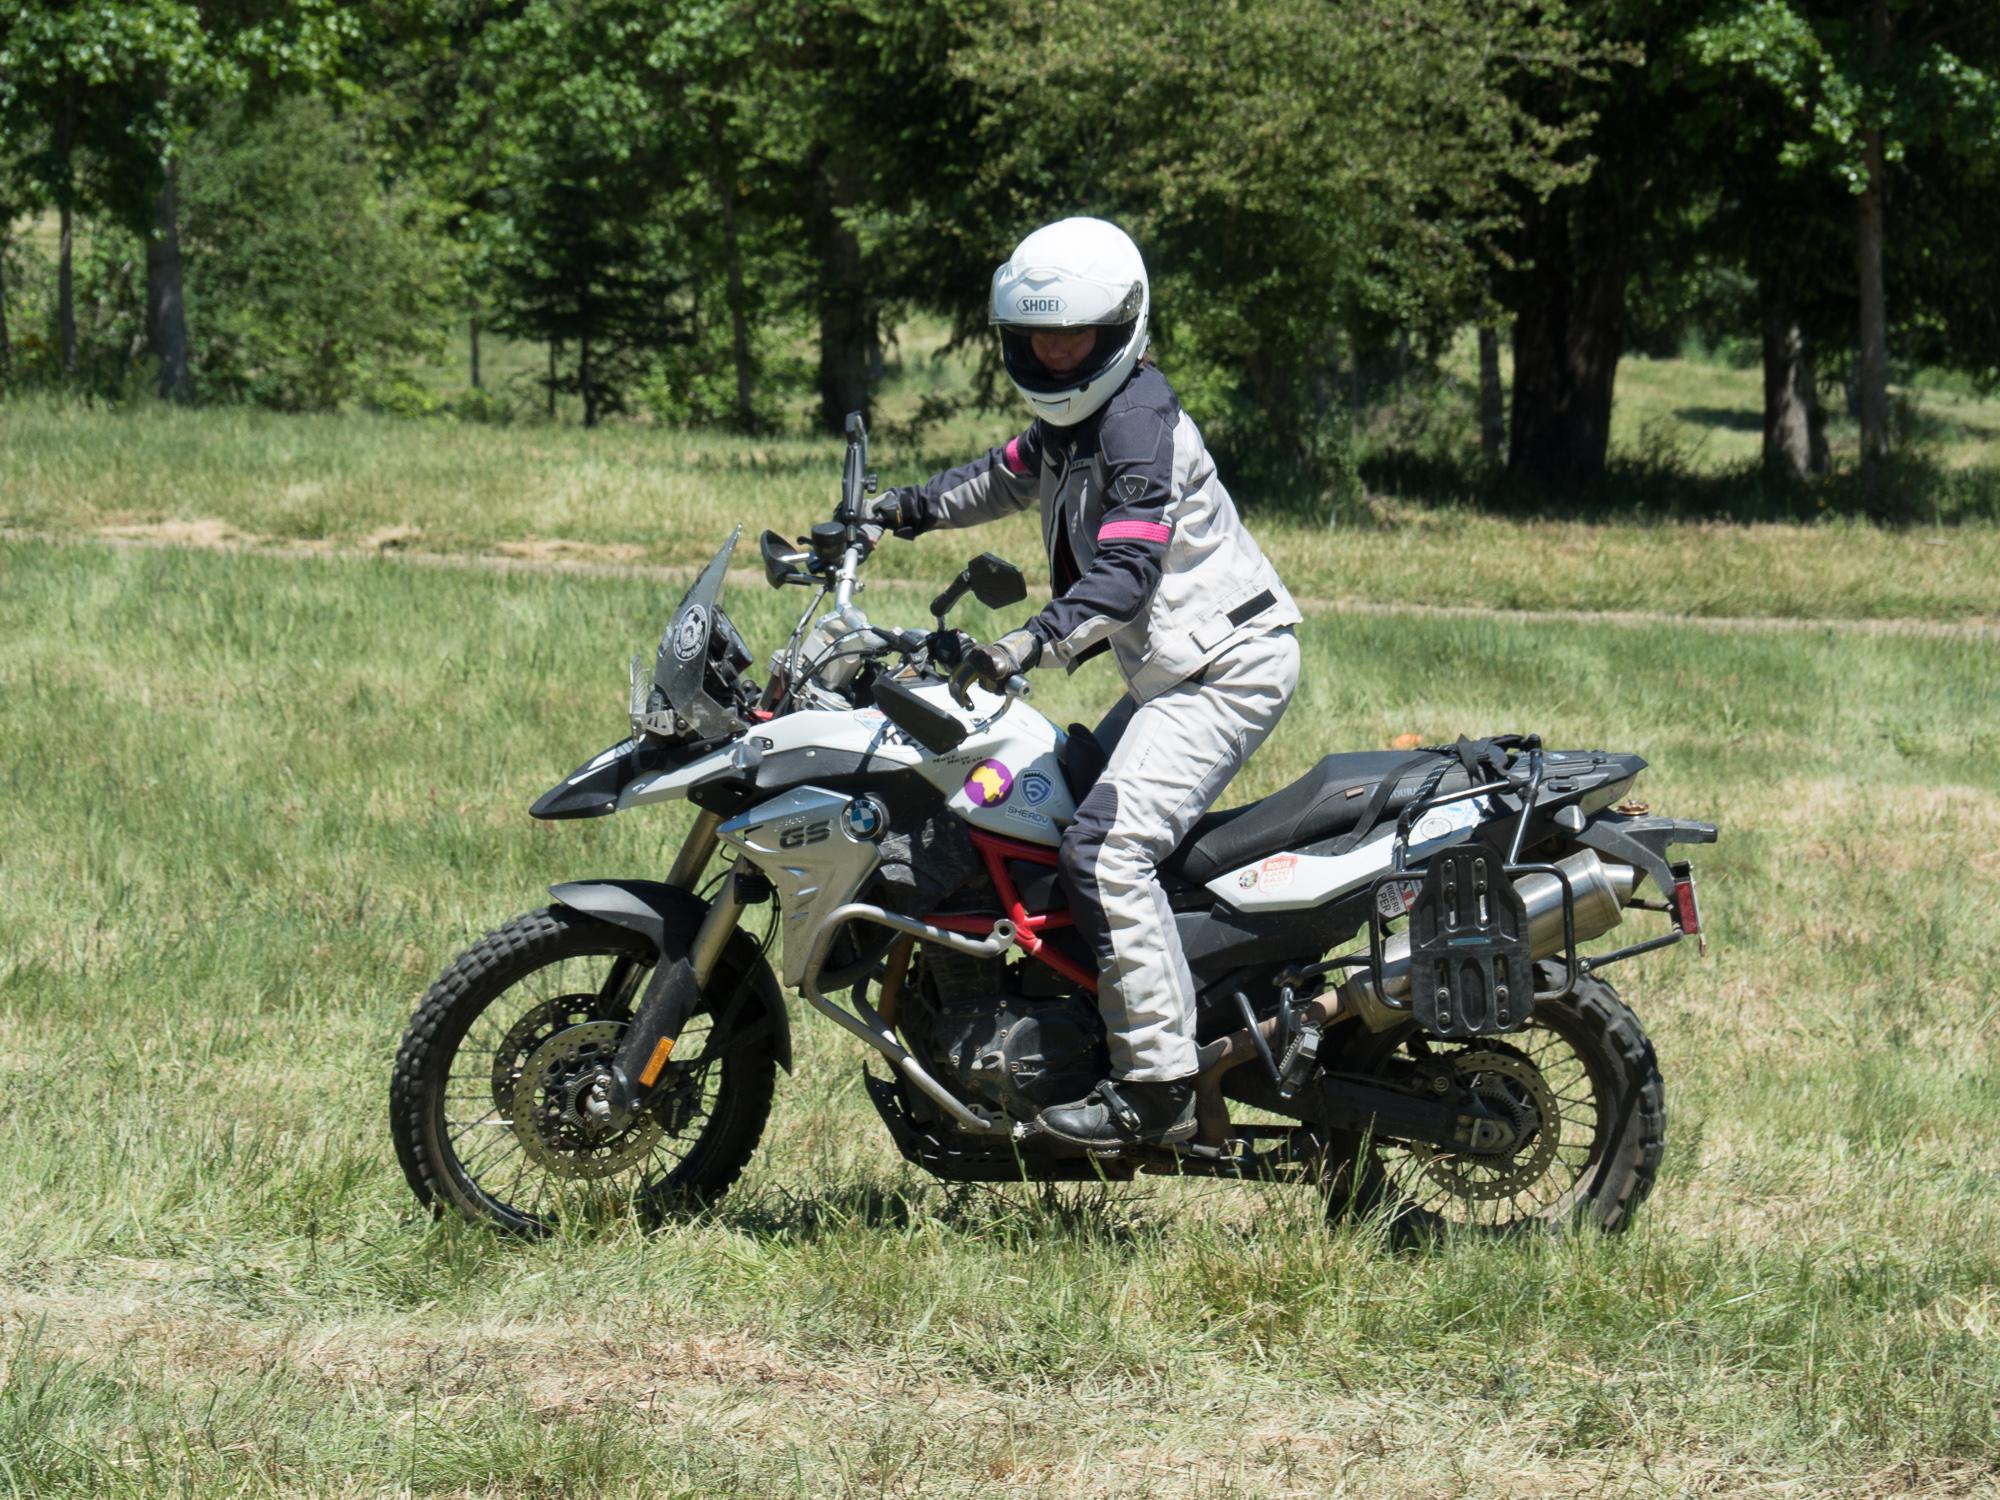 sheADV moto training course level 1/2 tight cornering